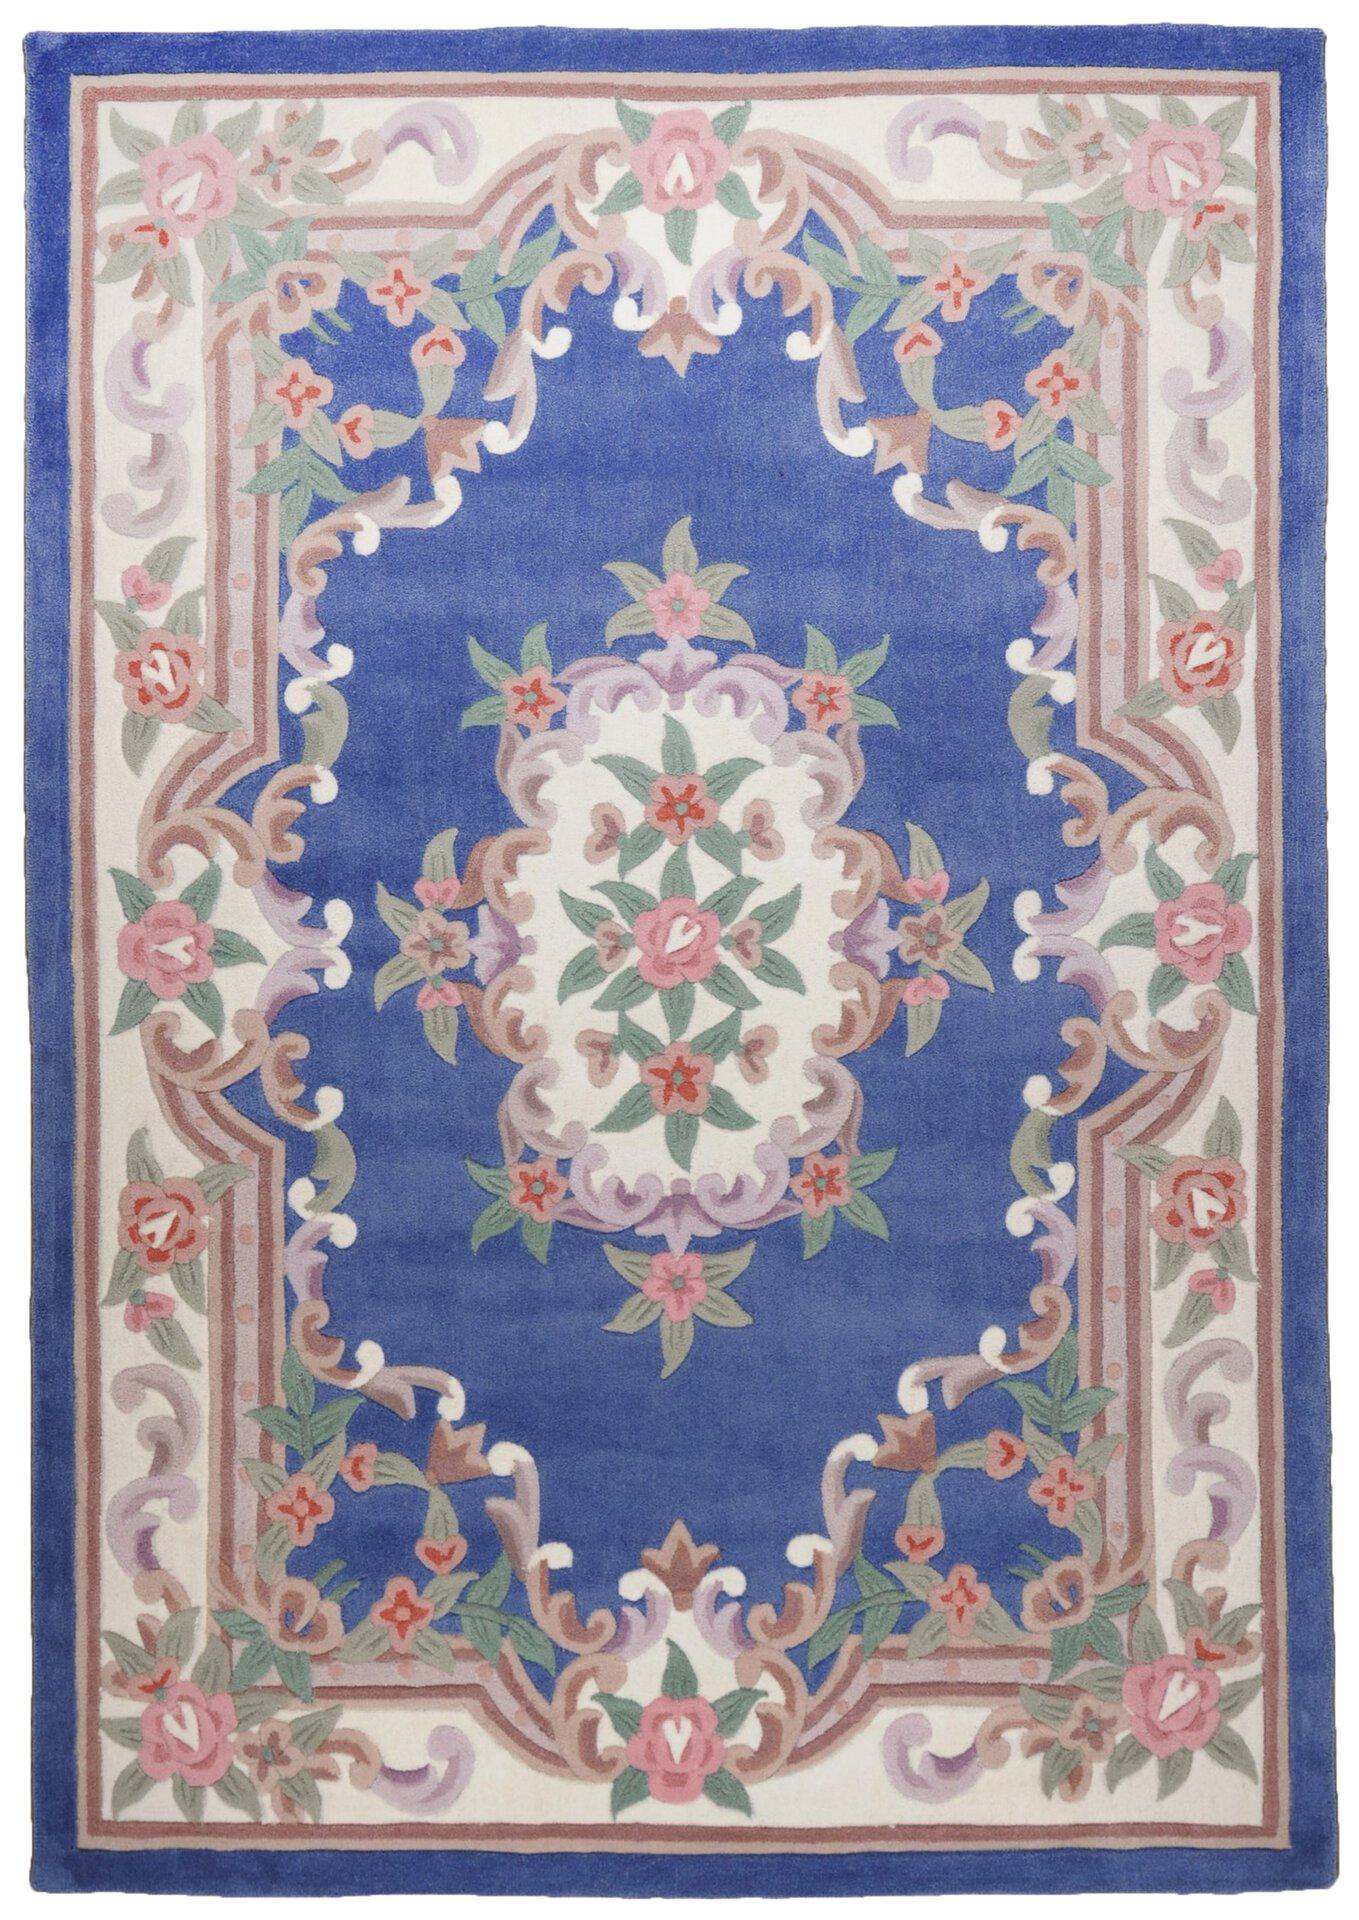 Handtuftteppich Ming Theko Textil Blau 1 x 1 cm